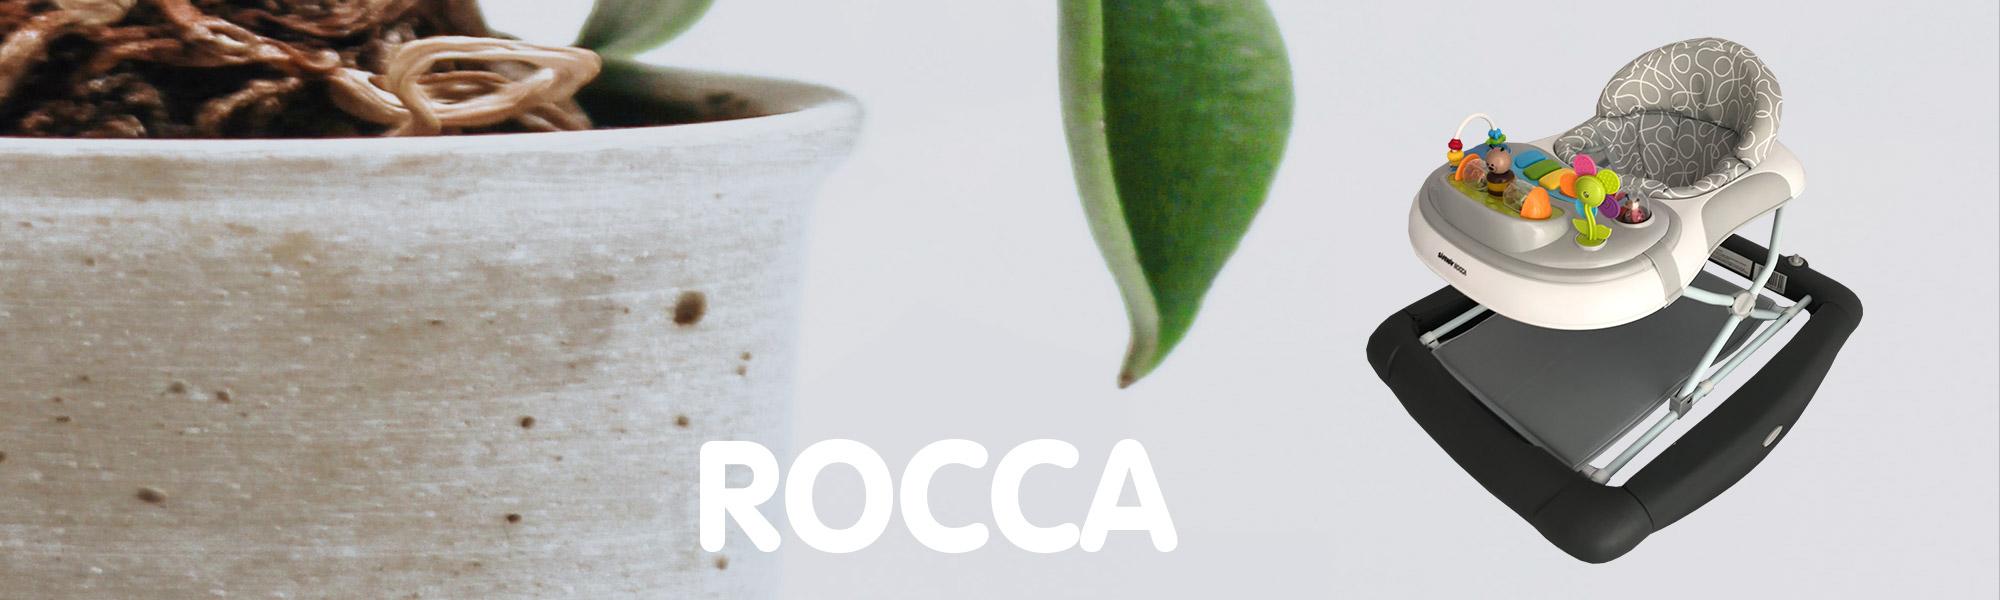 Rocca-2000x600